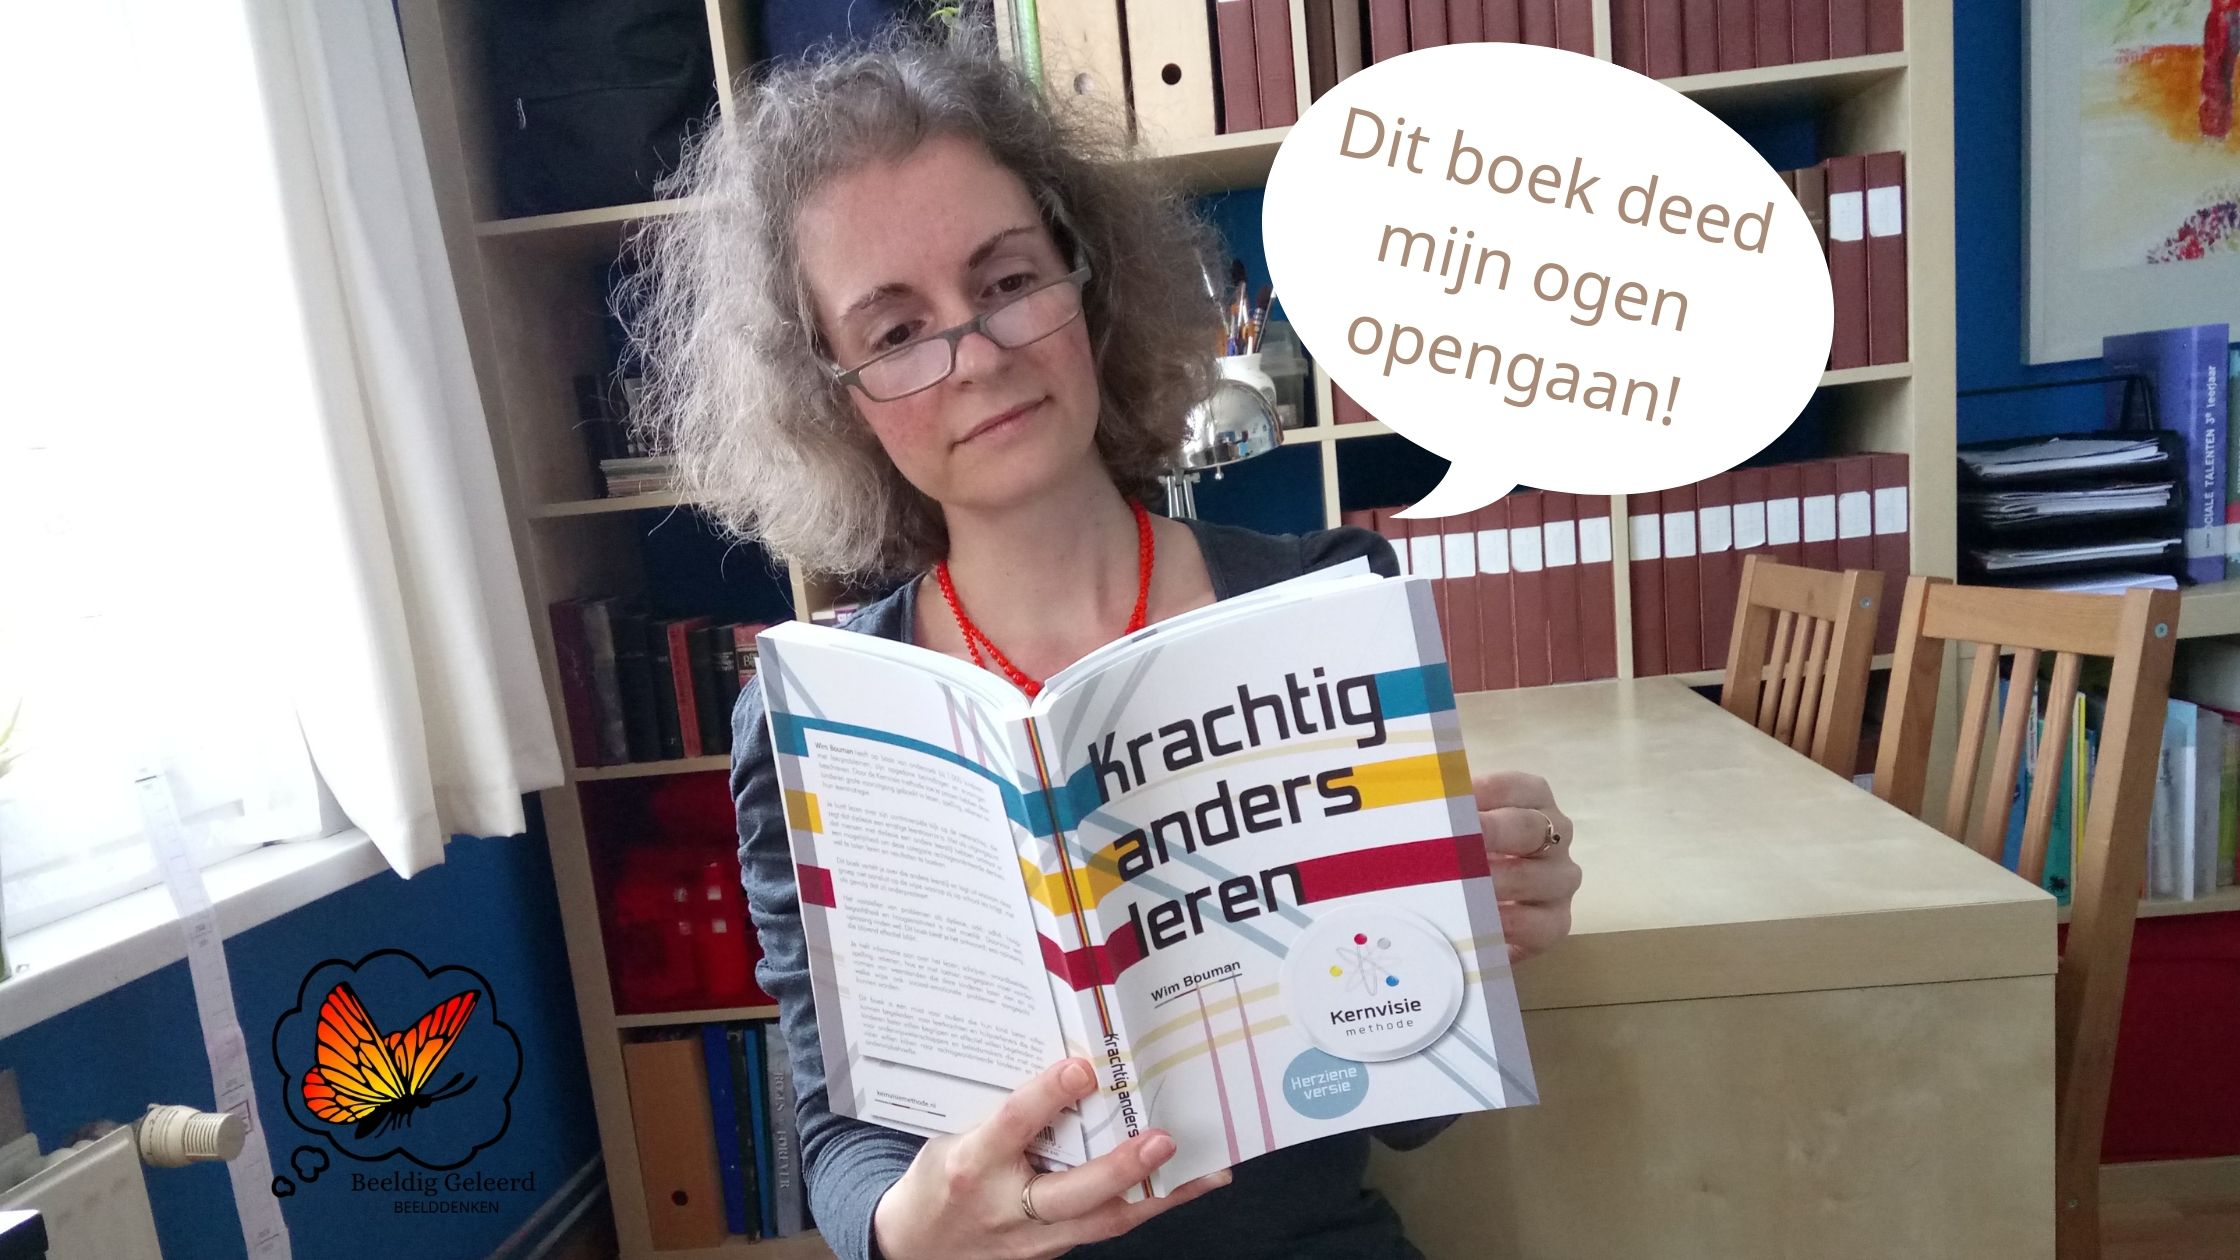 Krachtig-anders-leren-dyslexie-is-geen-stoornis